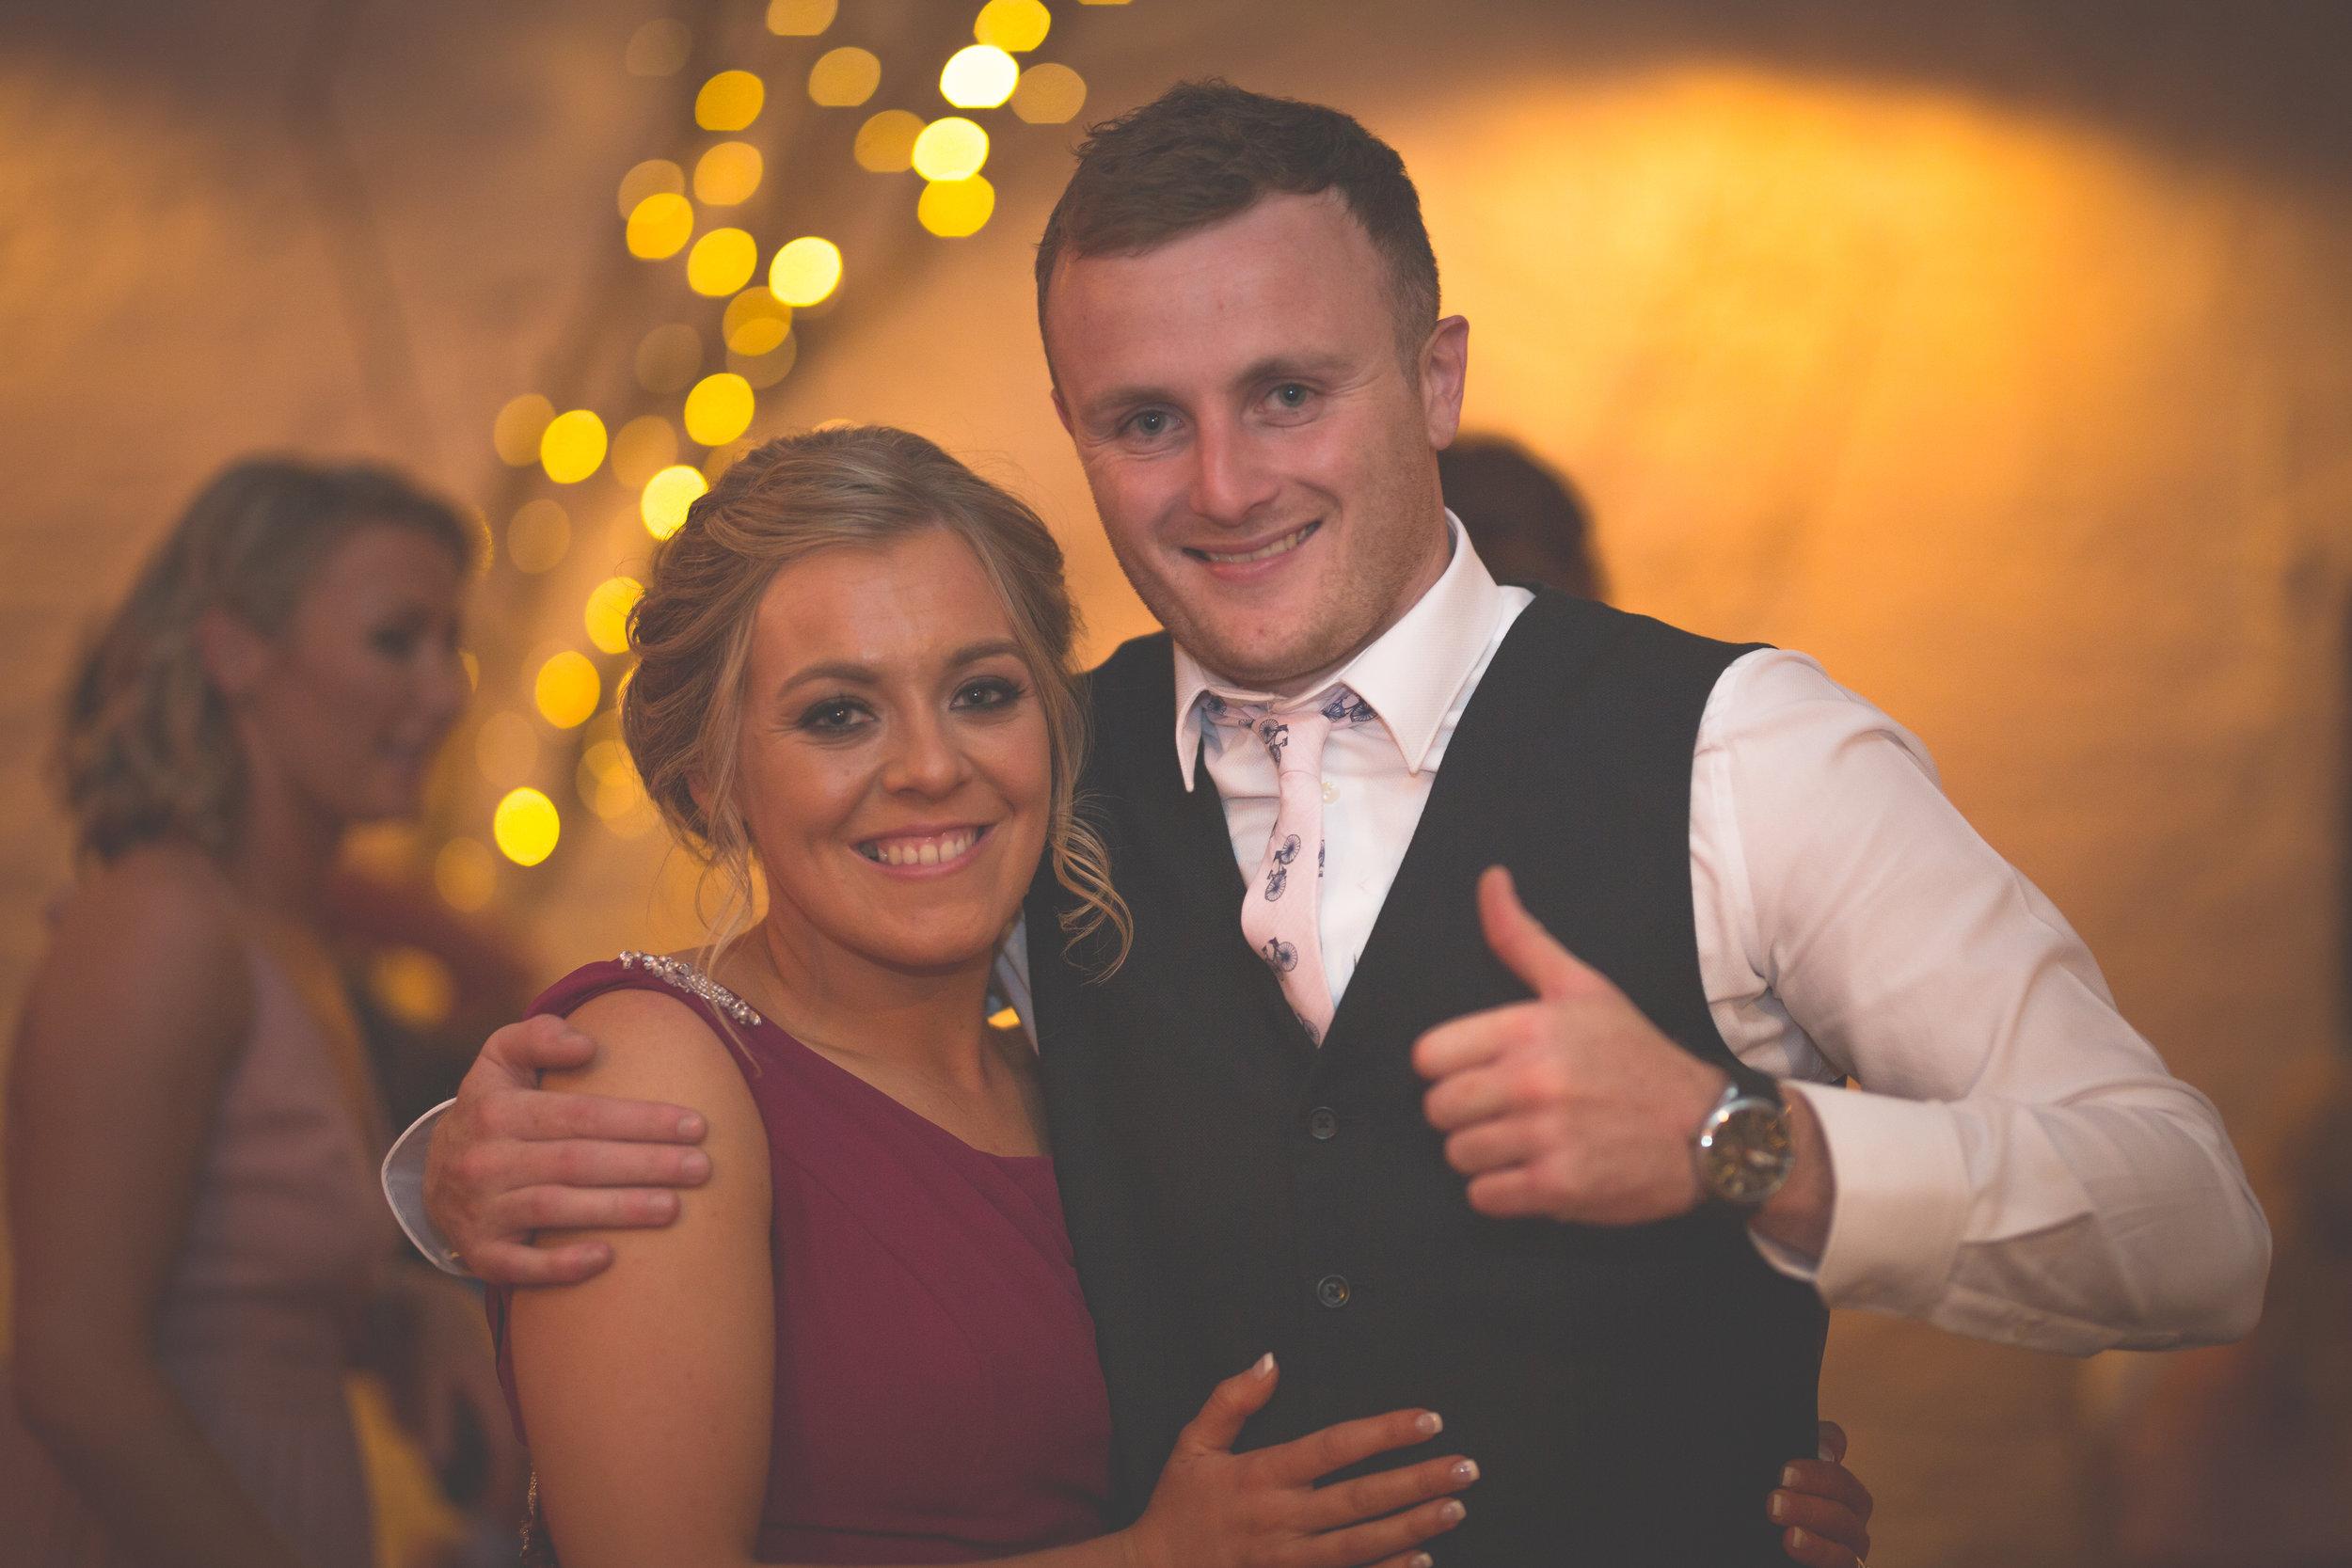 Brian McEwan Wedding Photography | Carol-Annee & Sean | The Dancing-83.jpg